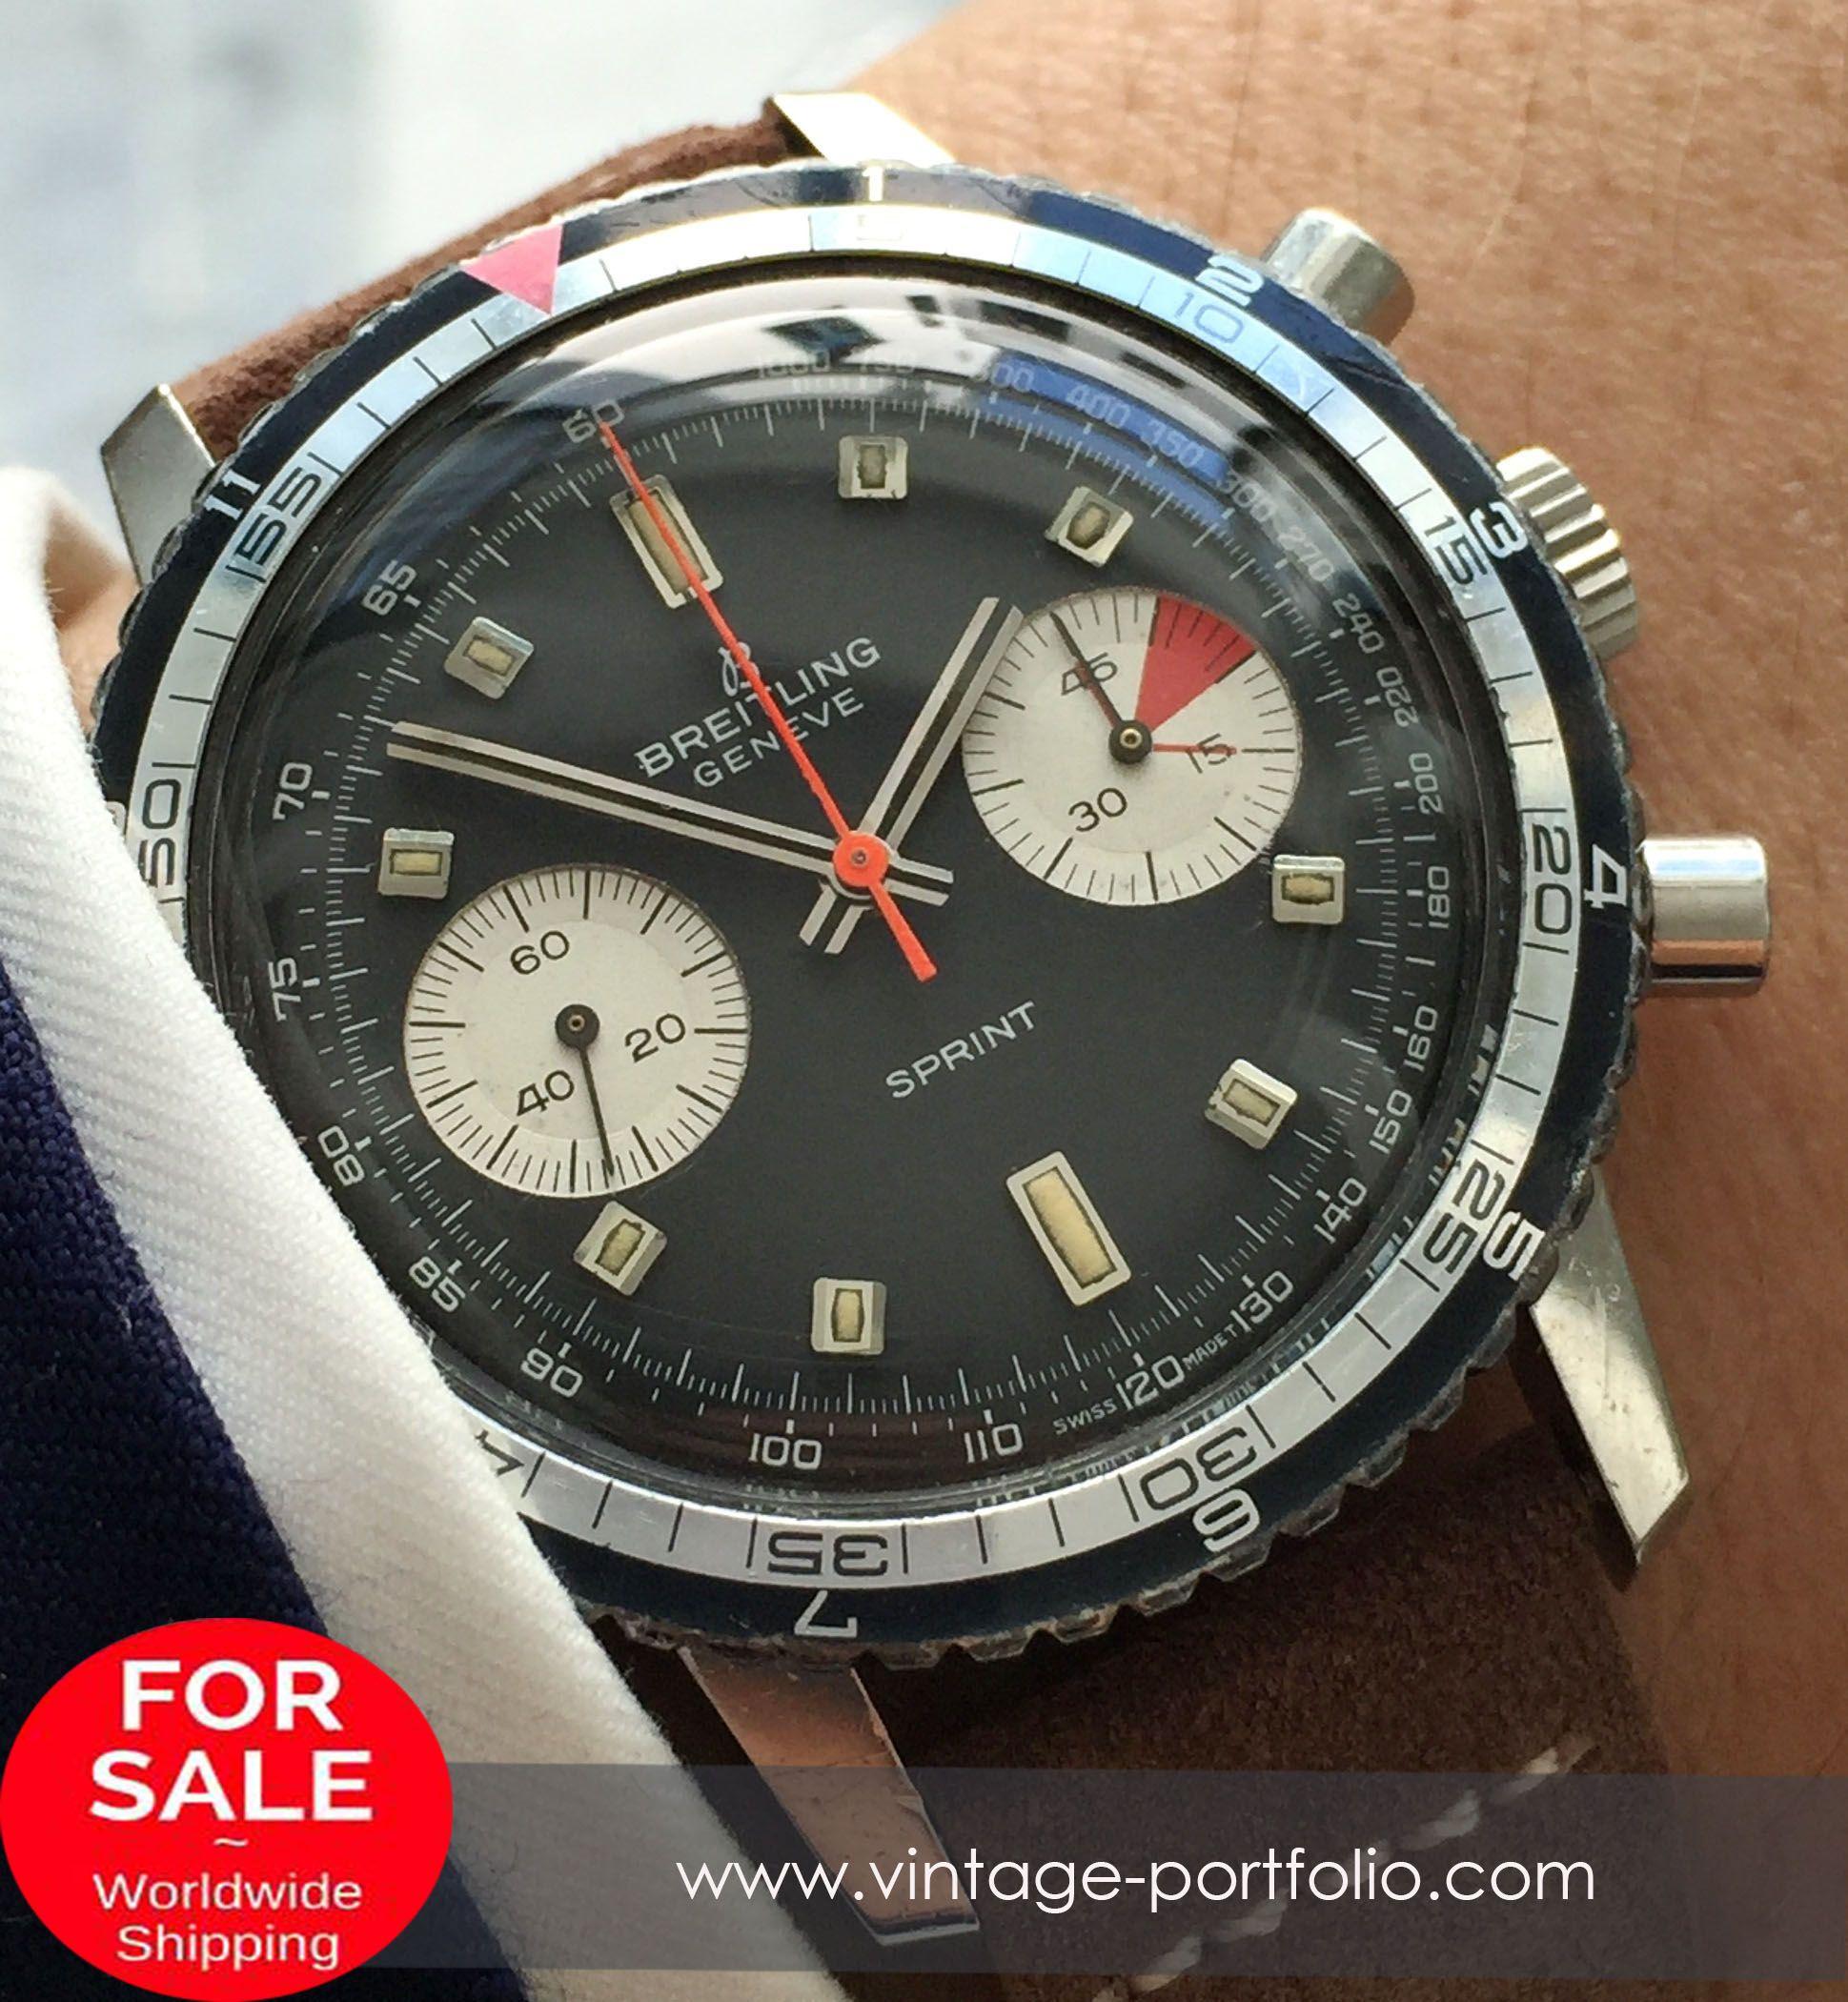 Breitling Sprint Reverse Panda Dial Vintage Vintage Portfolio Breitling Best Watches For Men Watches For Men